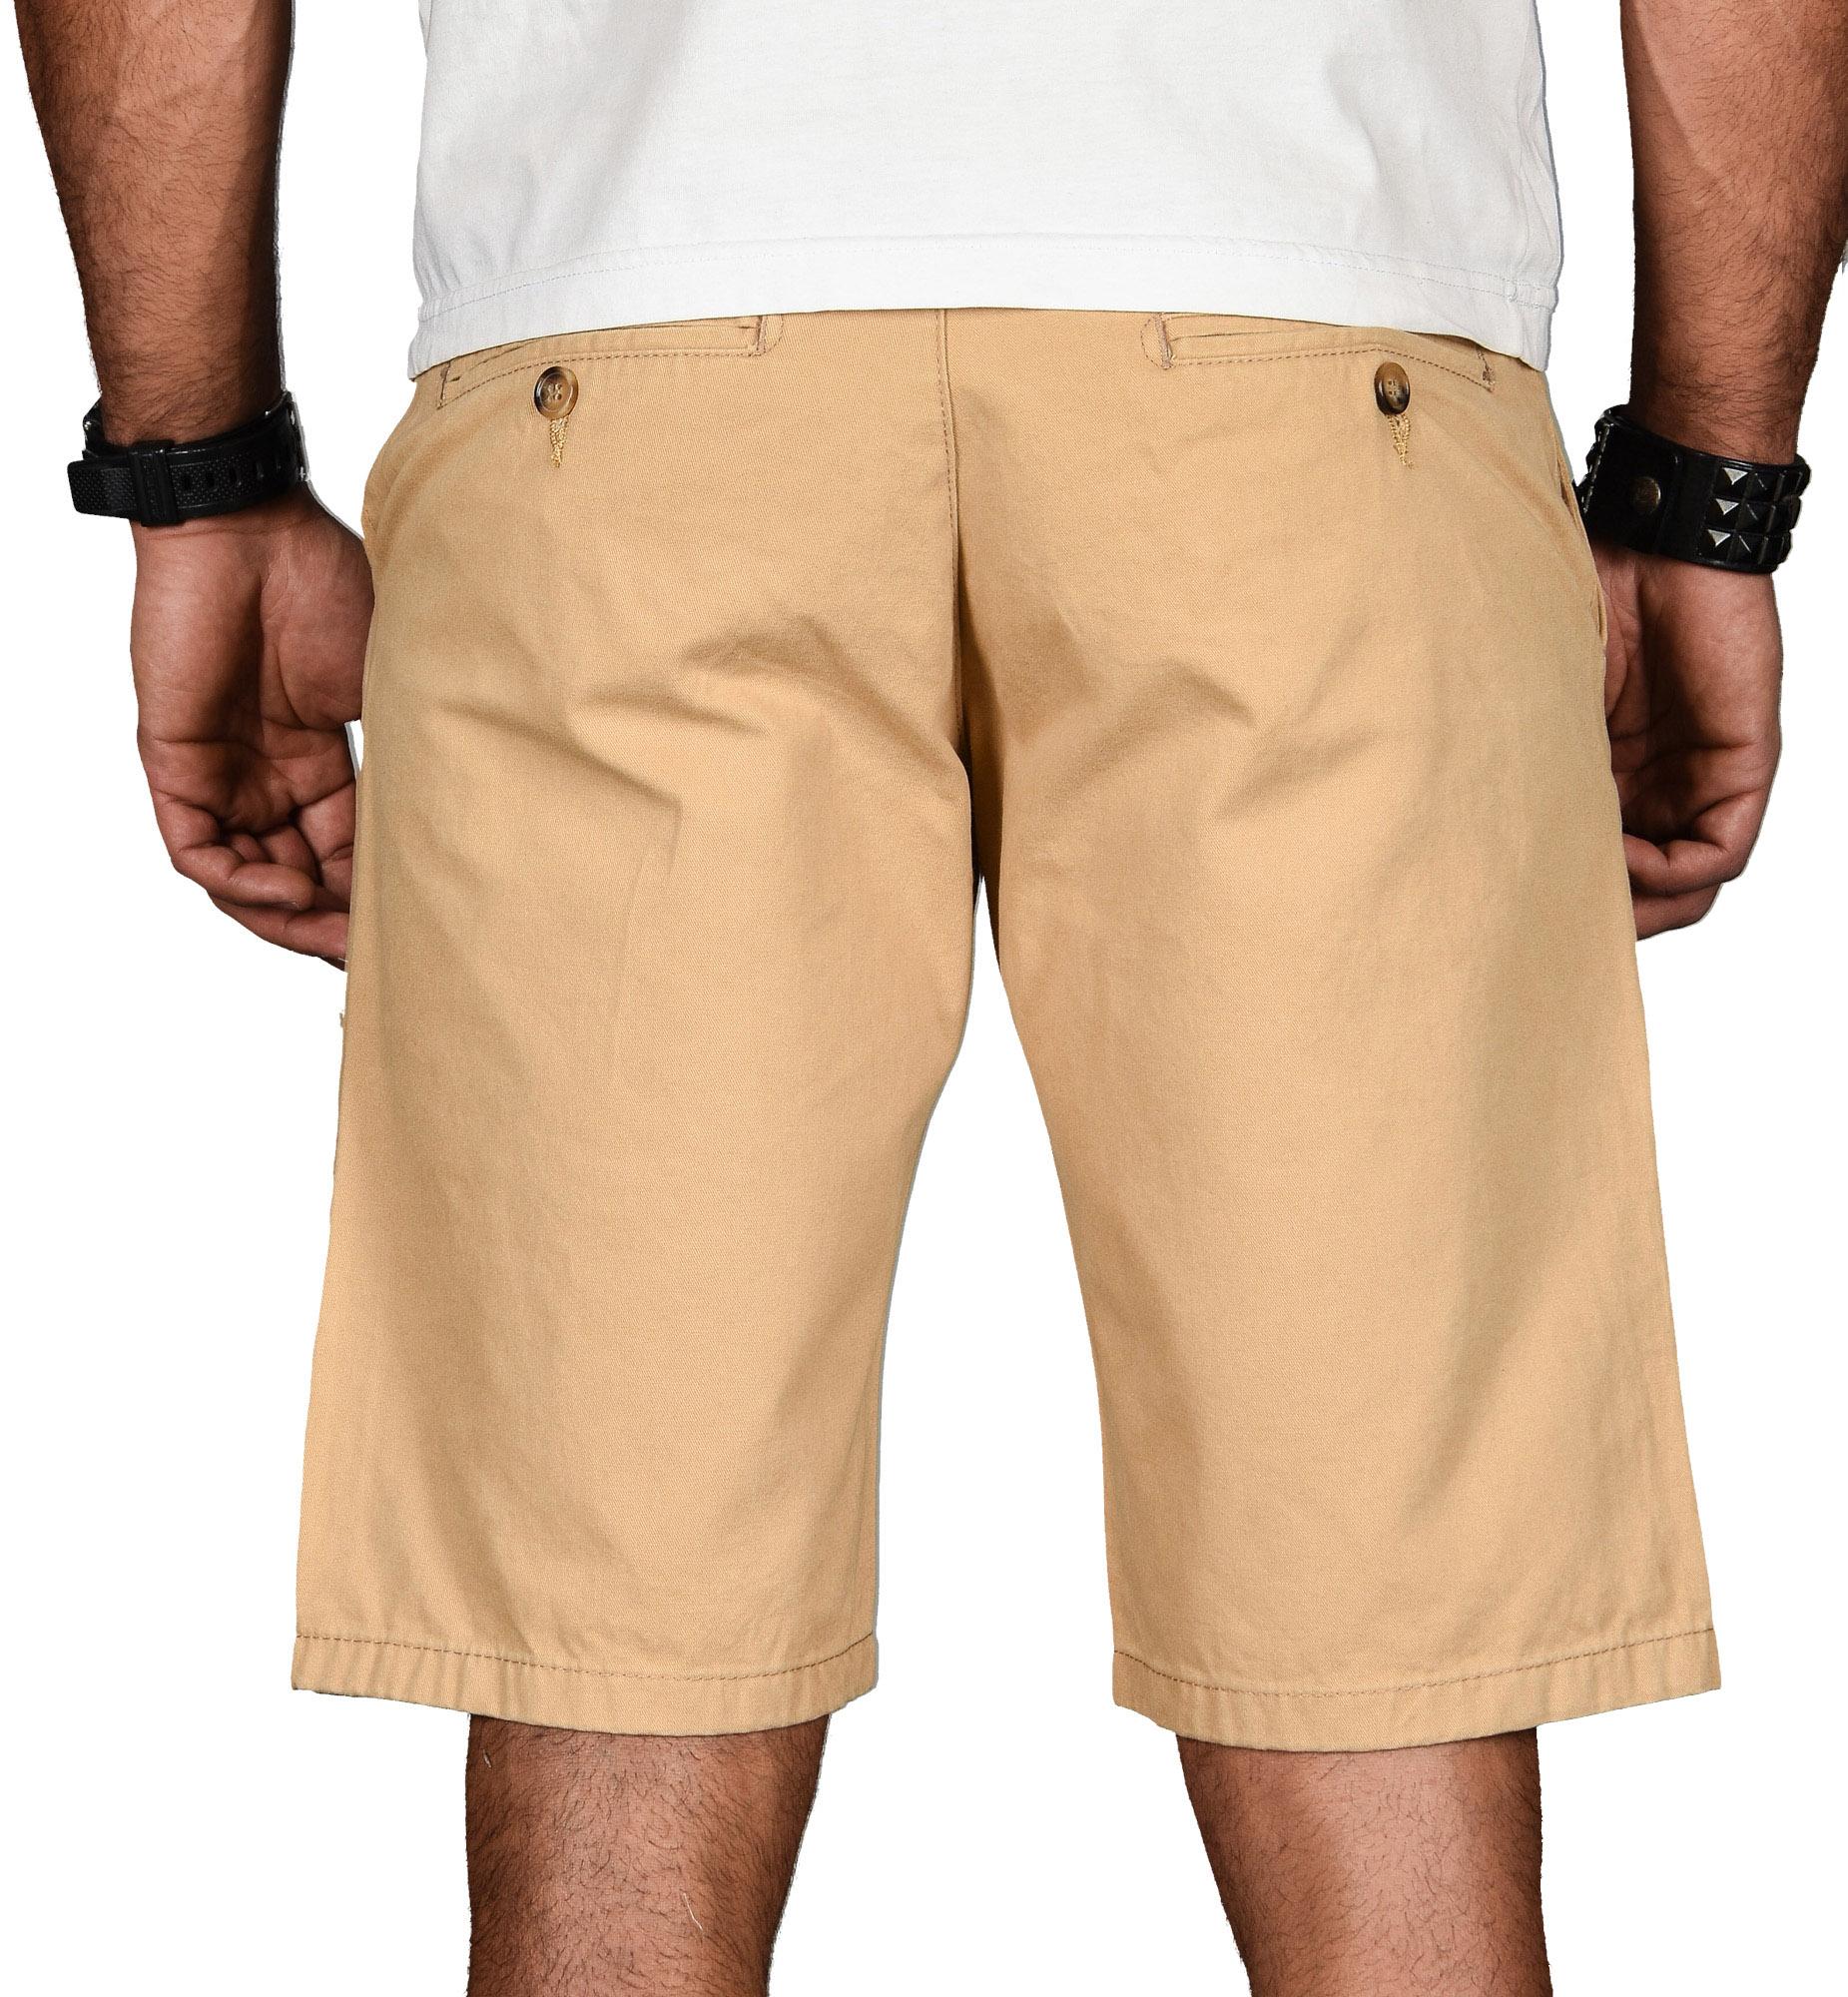 A-Salvarini-Herren-Shorts-kurze-Sommer-Hose-mit-Guertel-Short-Bermuda-NEU-AS096 Indexbild 28